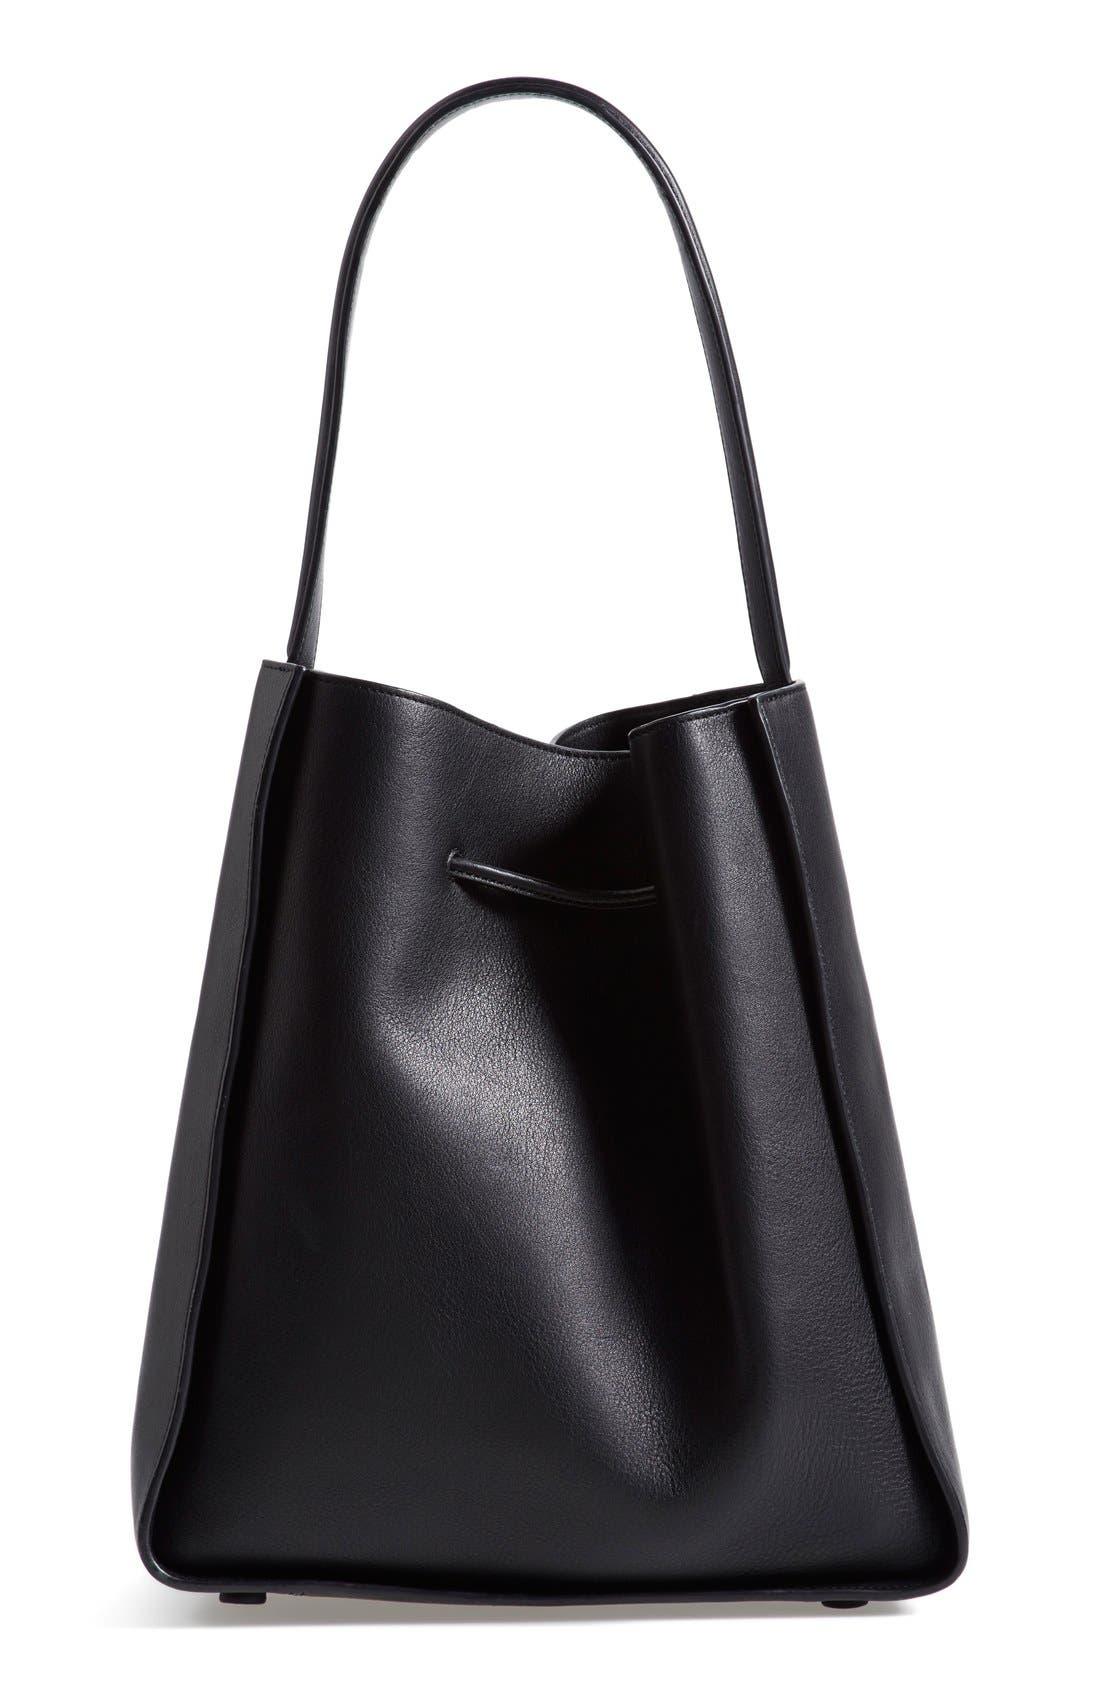 Alternate Image 2  - 3.1 Phillip Lim 'Large Soleil' Leather Bucket Bag